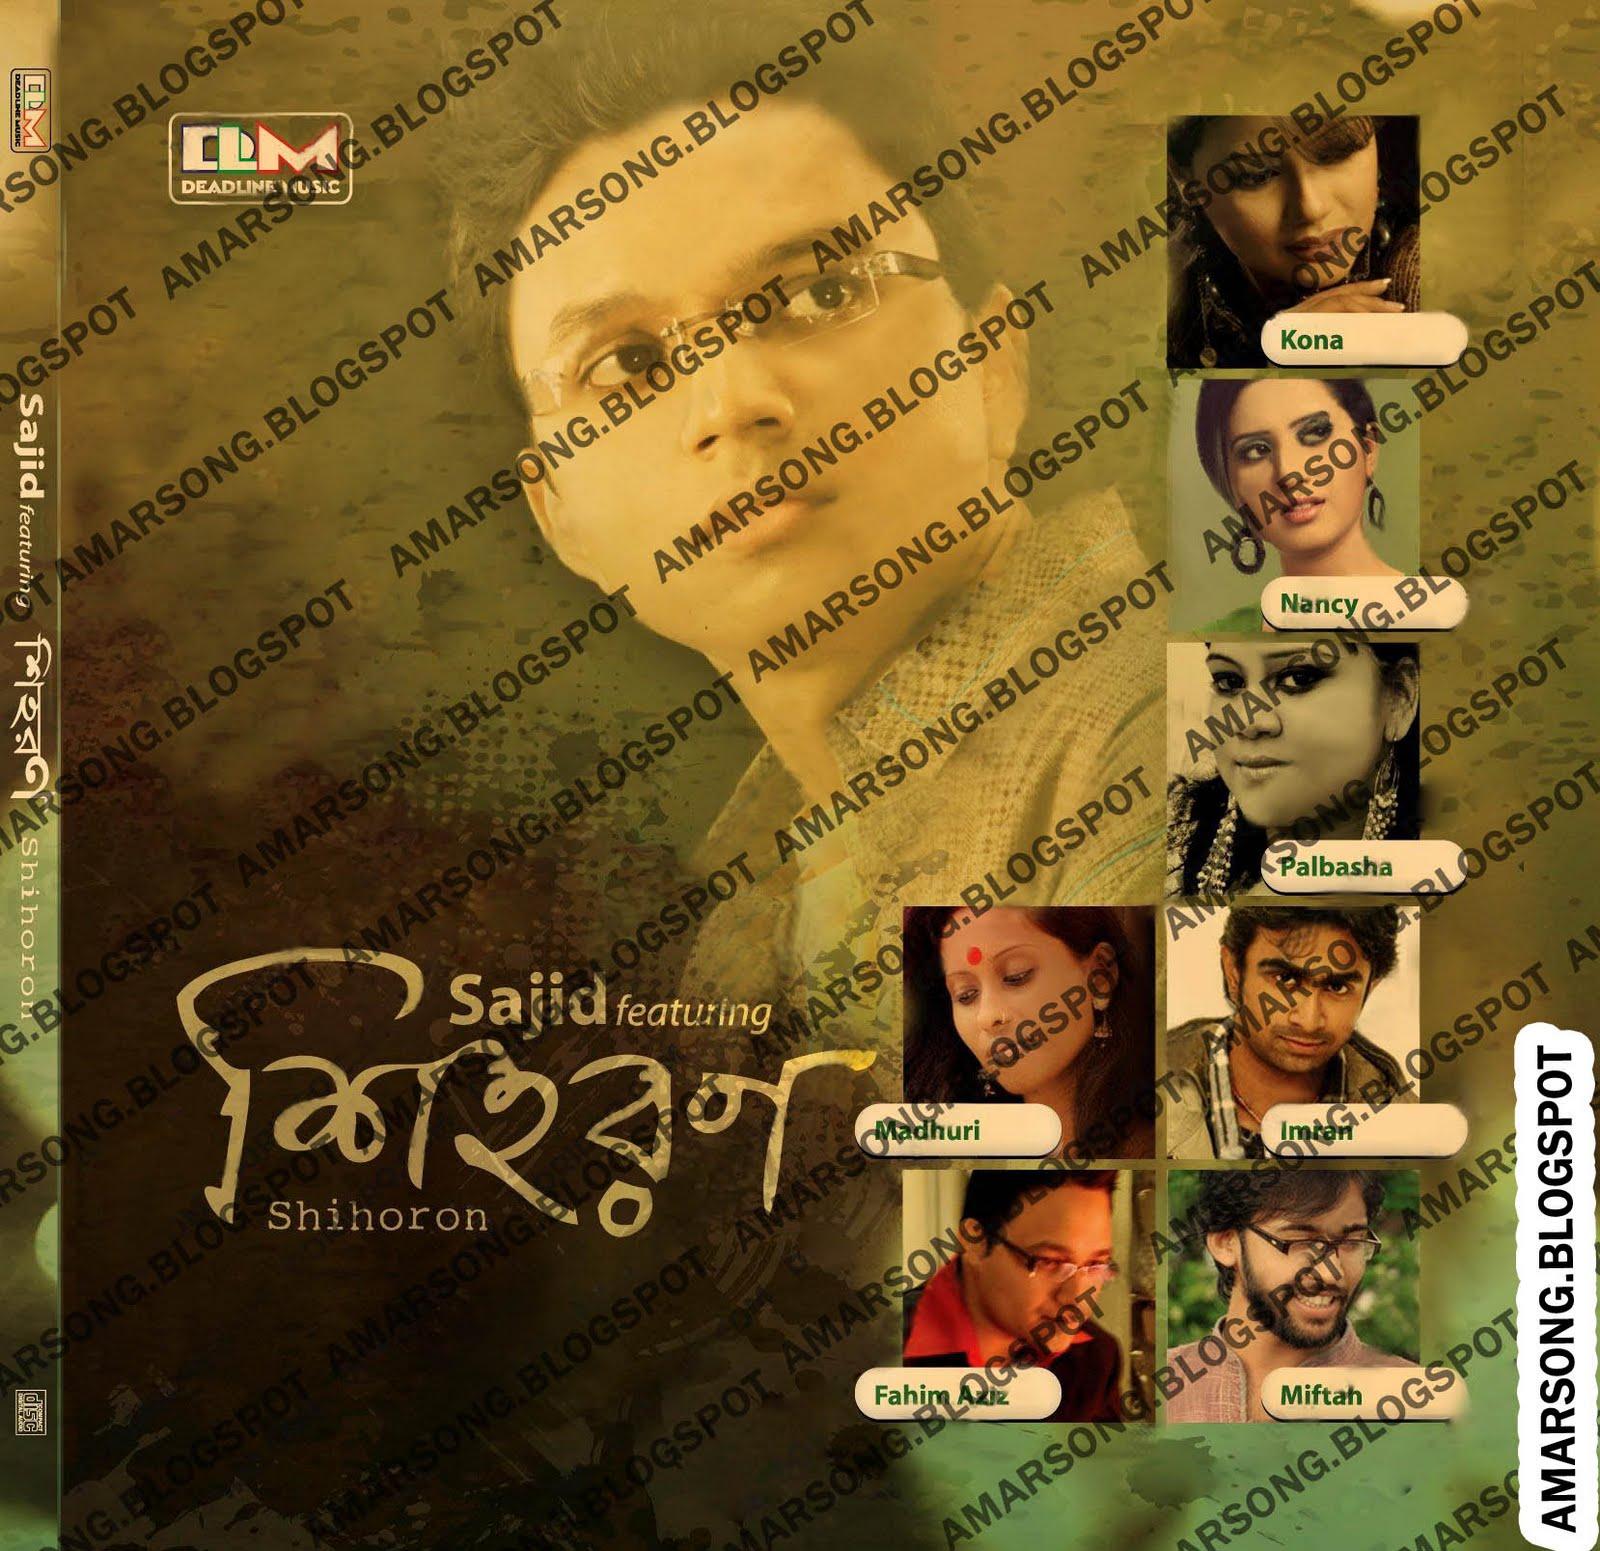 Sajid Ft VA - Shihoron [Eid Album 2011][Promo Download]